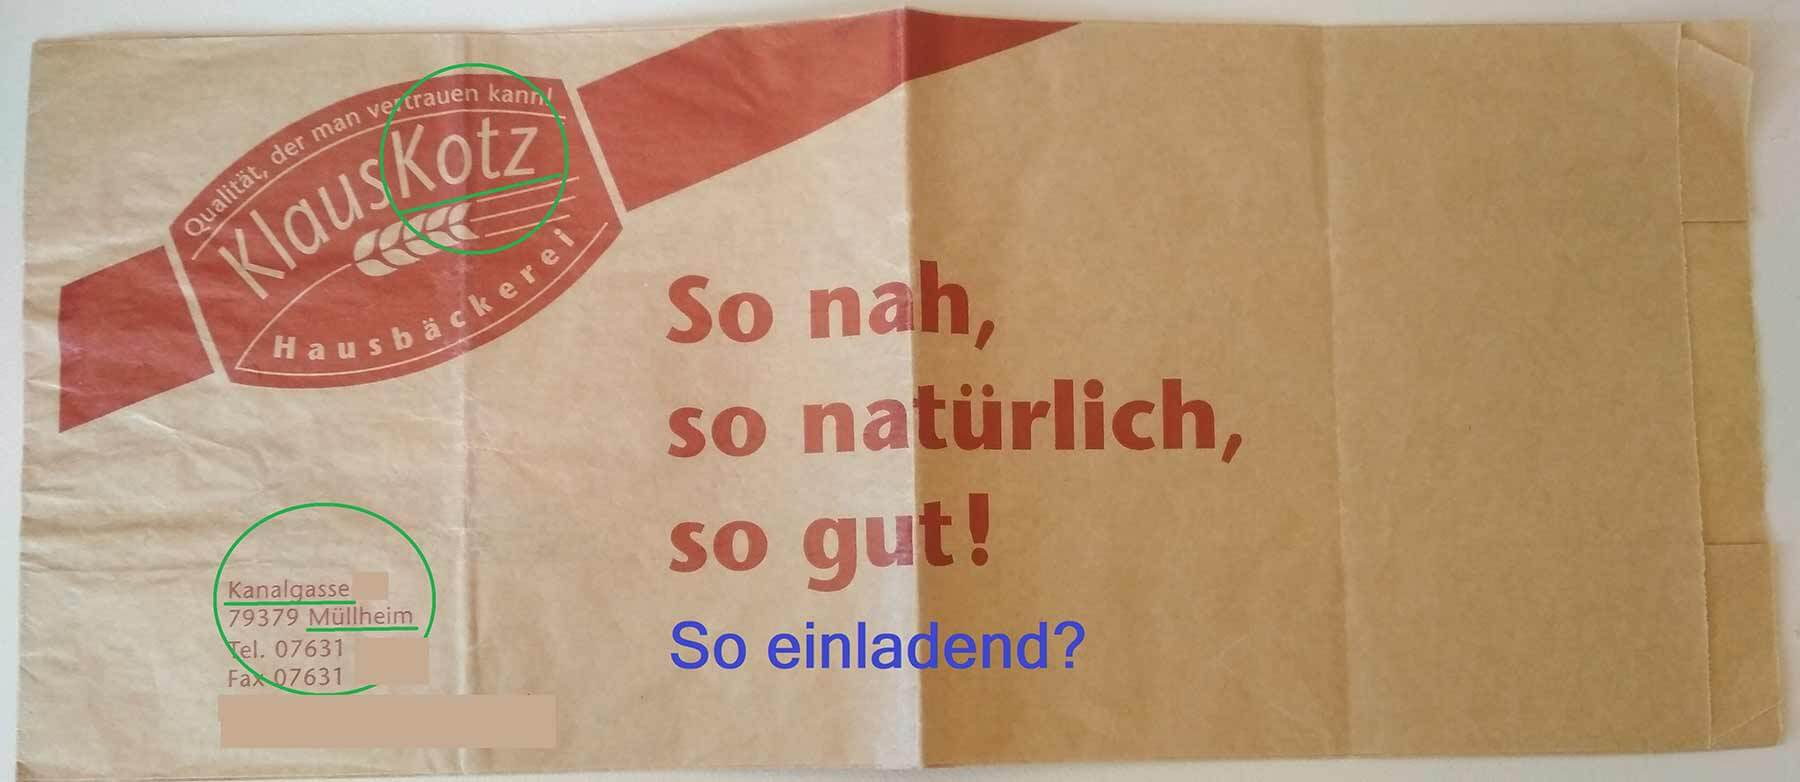 Bilderparade DCLVII LangweileDich.net_Bilderparade_DCLVII_21